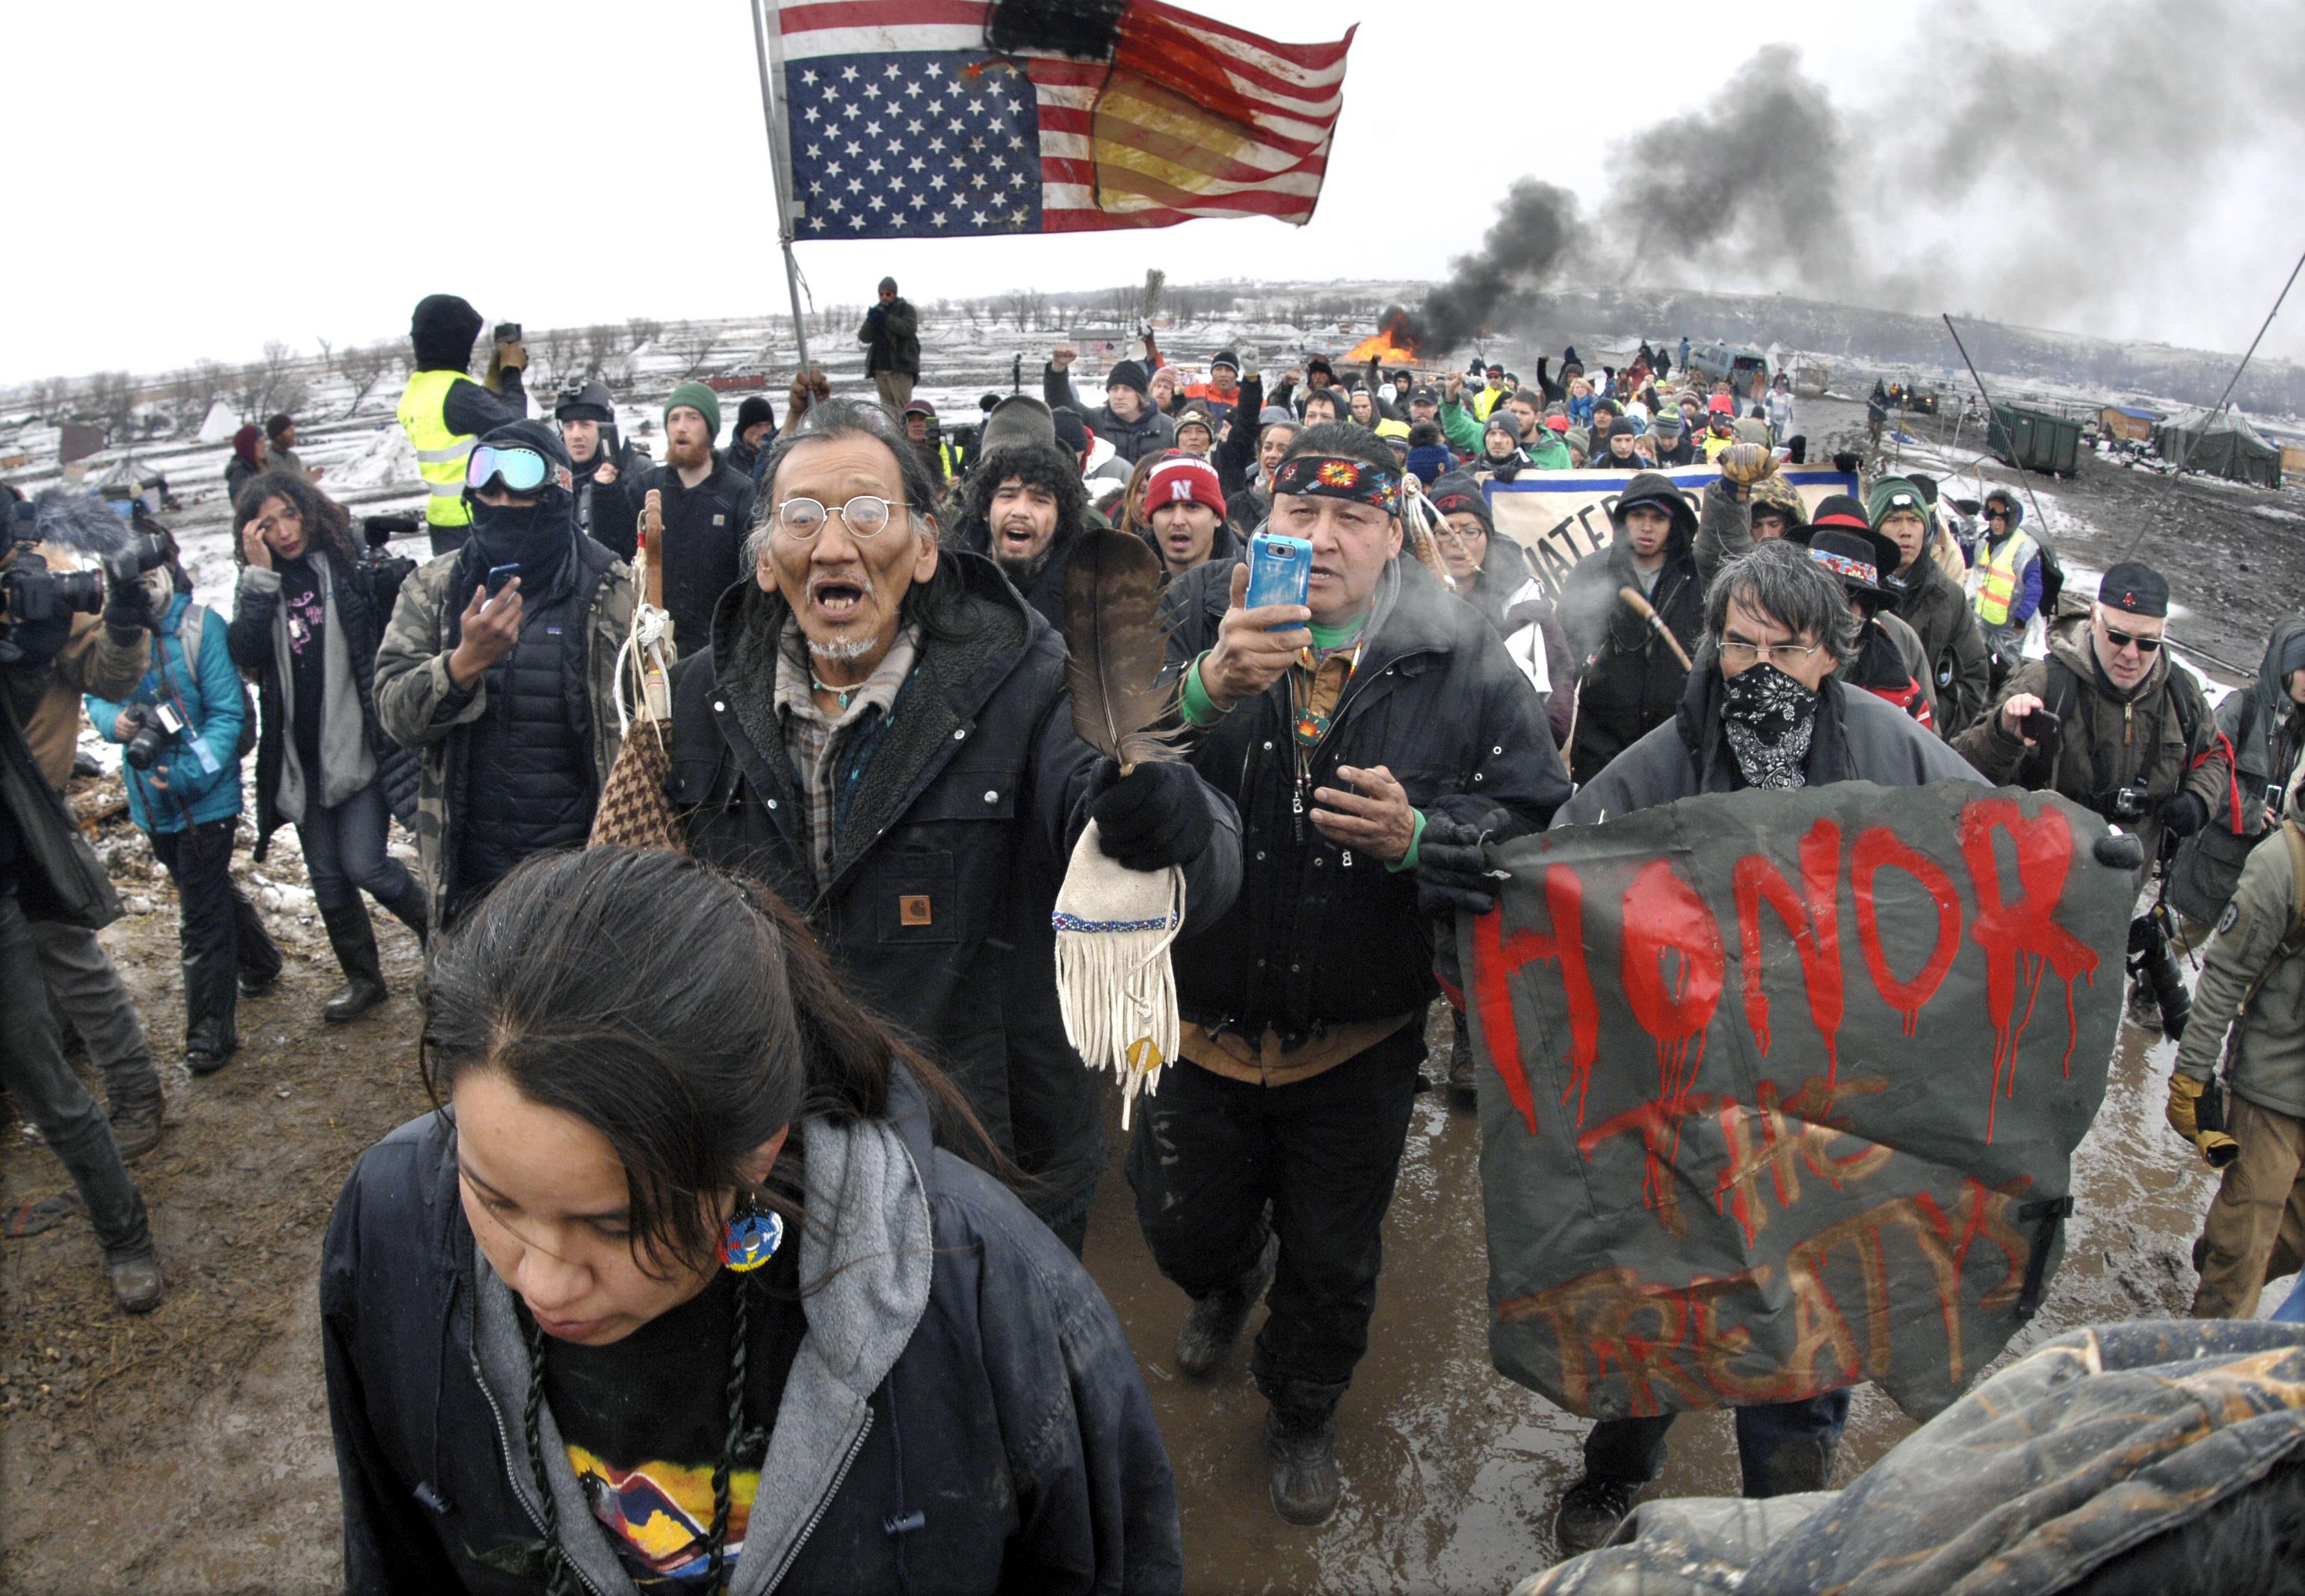 Lawsuit: North Dakota officers used violence on protester